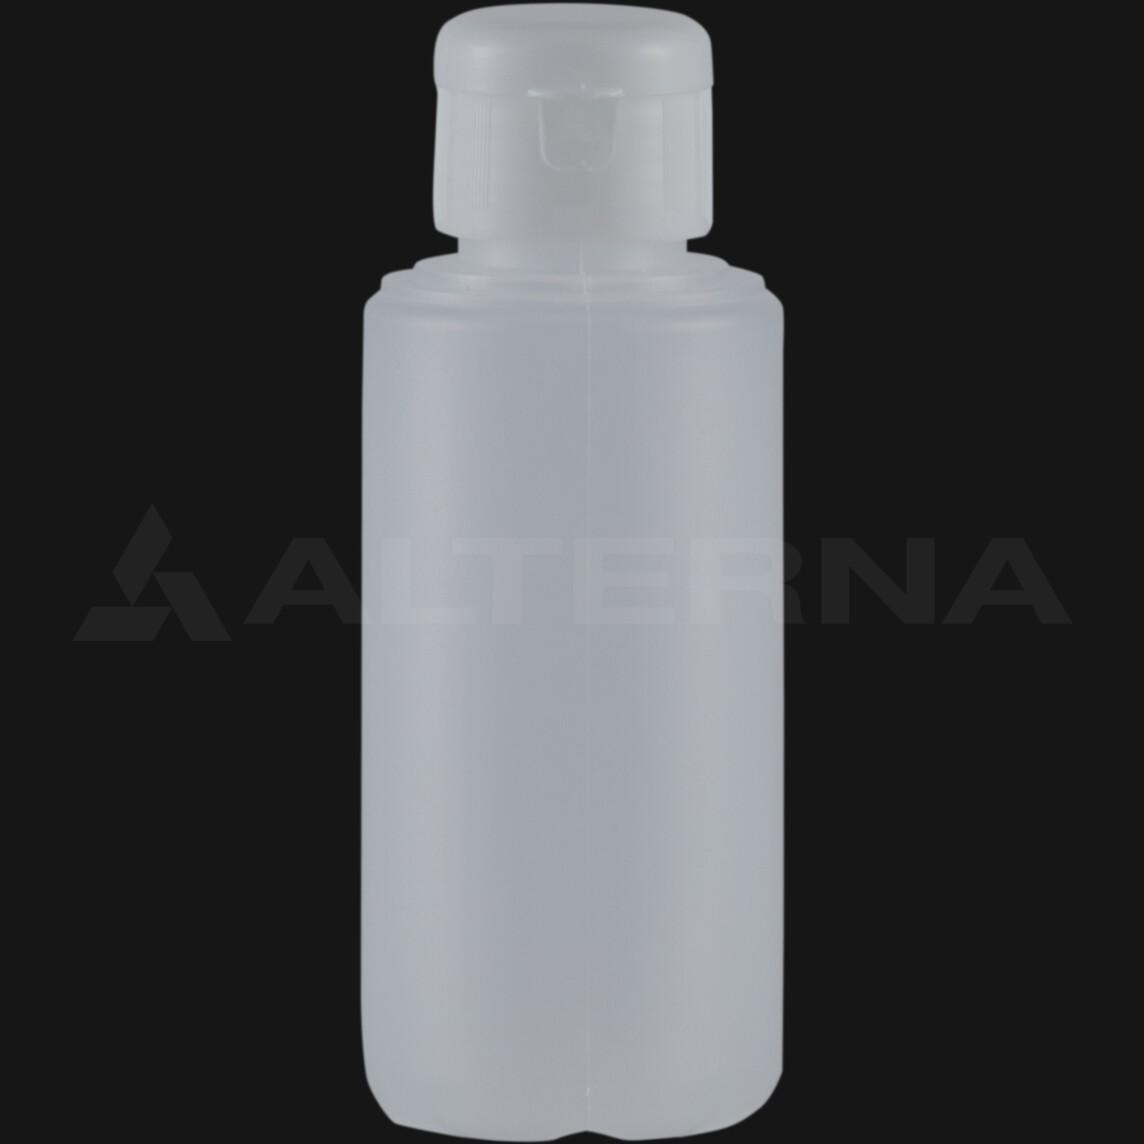 100 ml HDPE Bottle with 28 mm Flip Top Cap